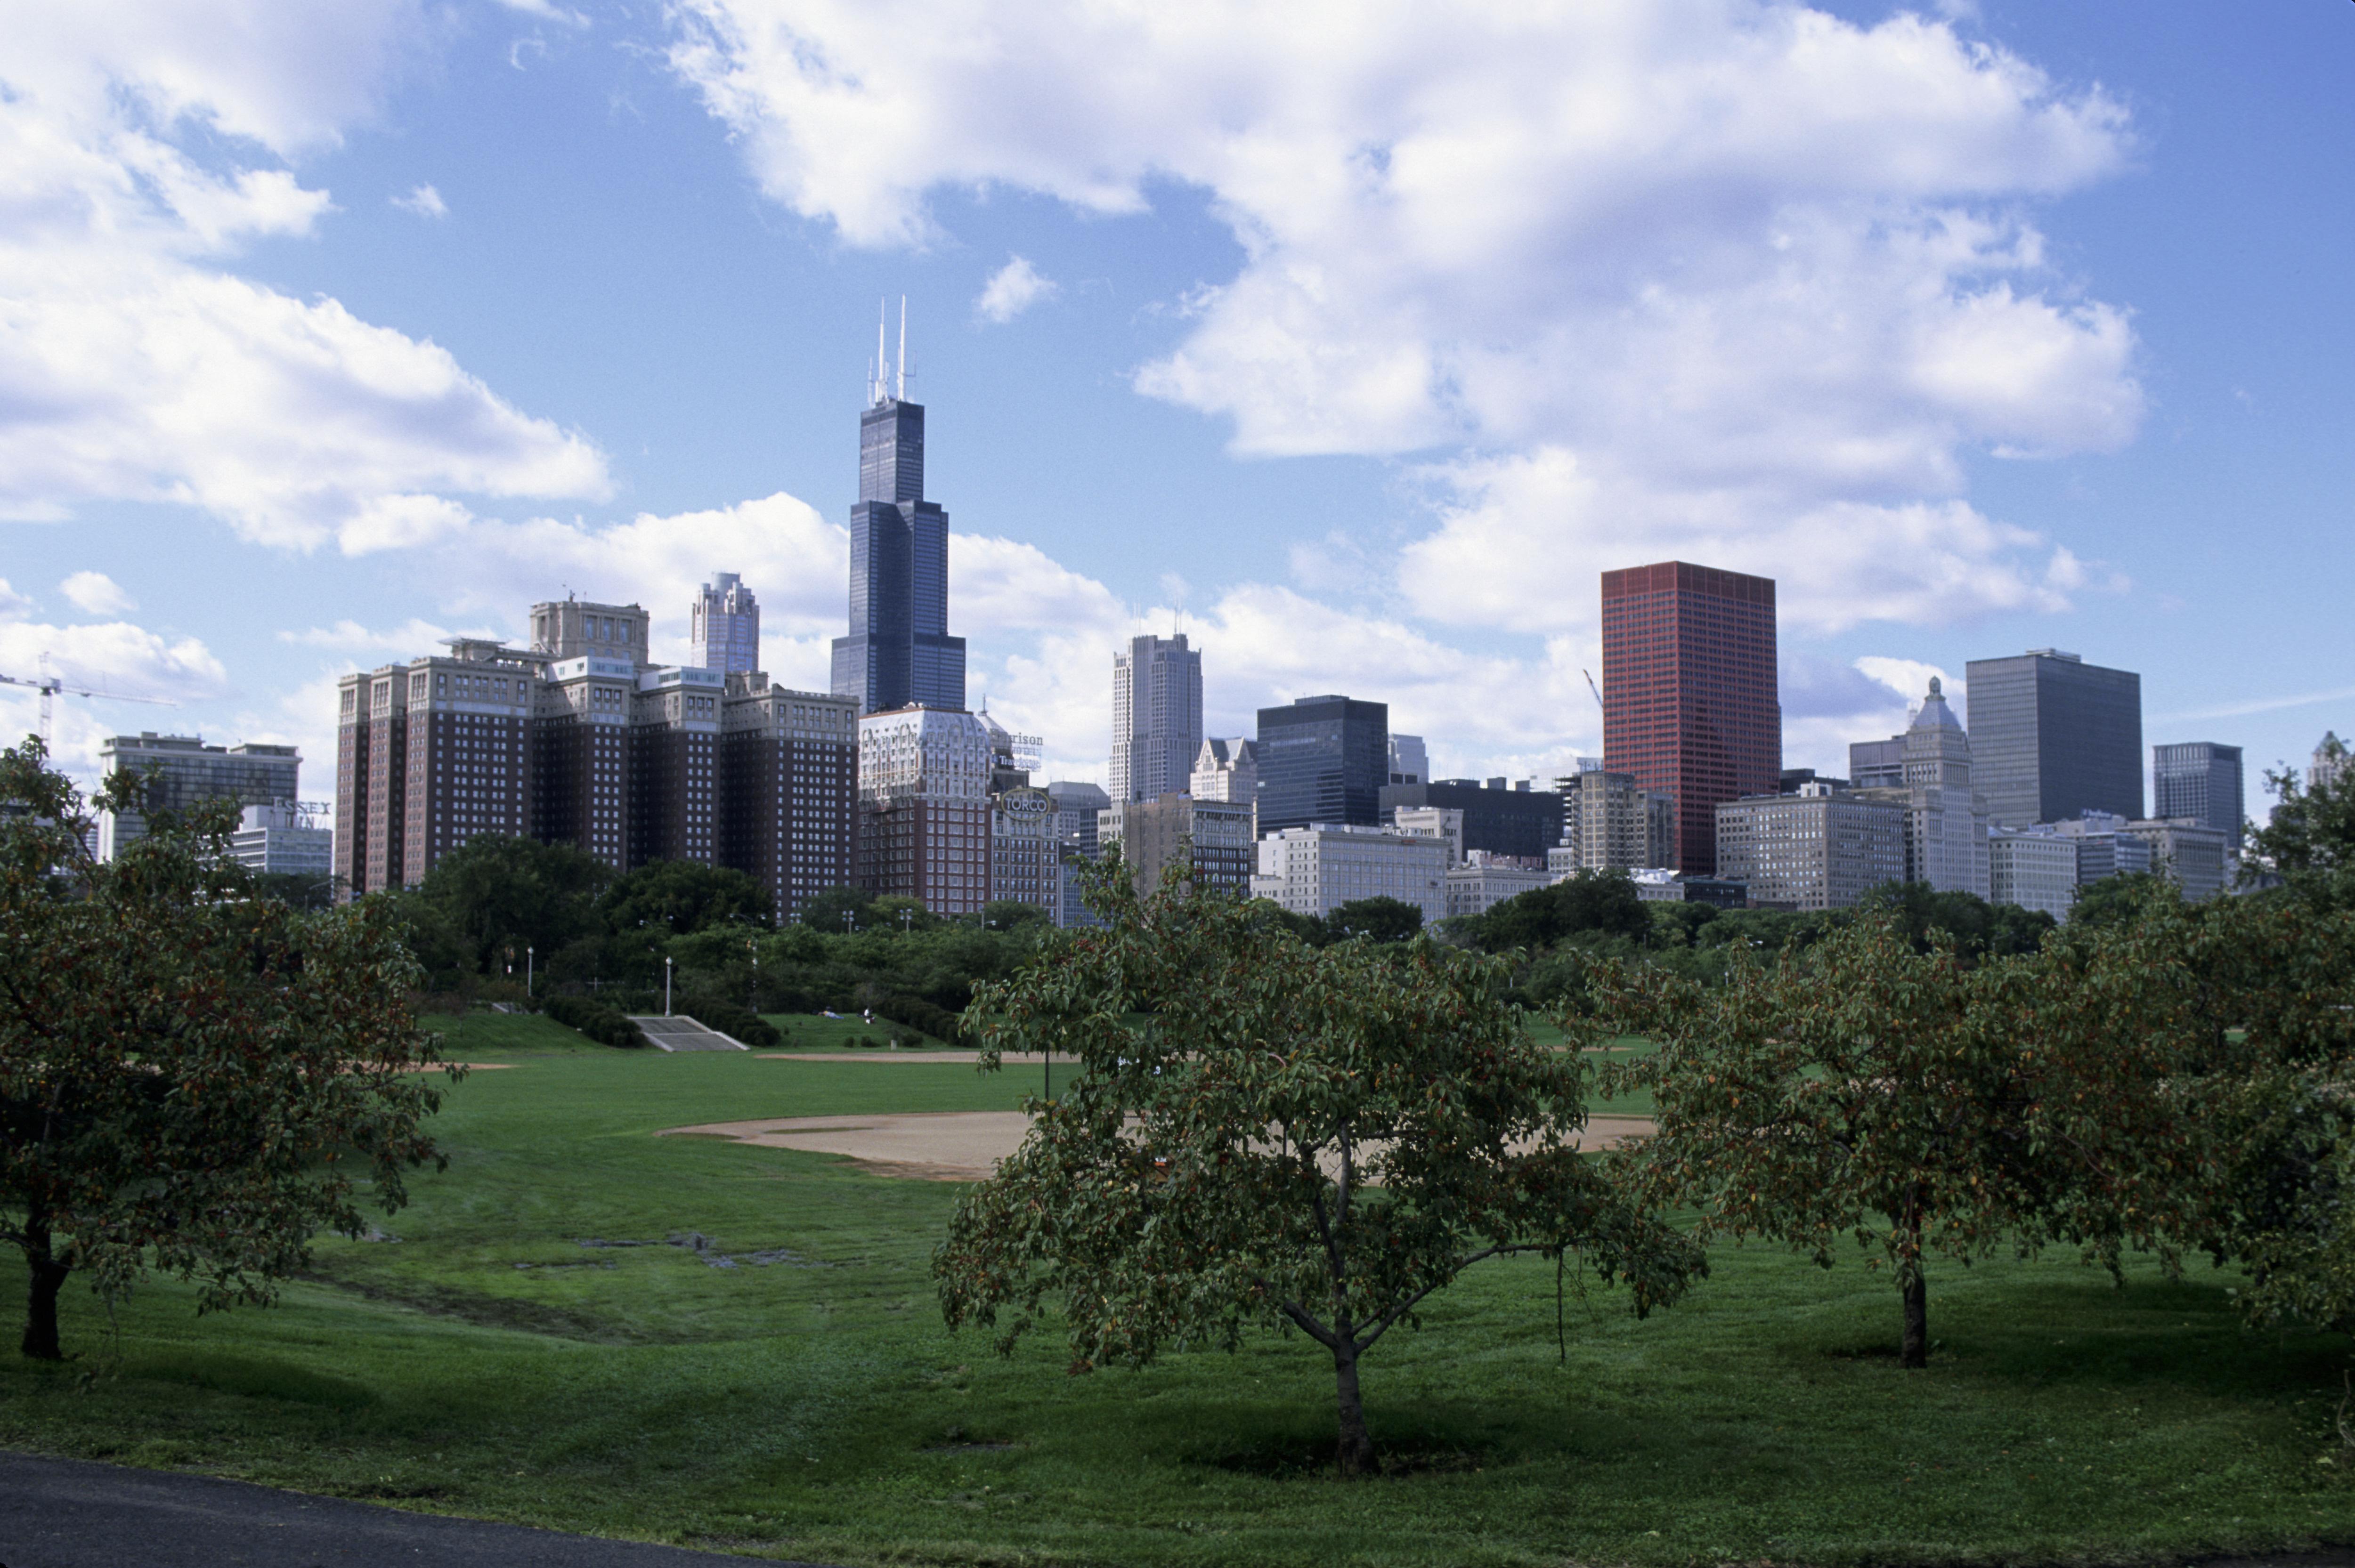 USA, Illinois, Chicago, Grant Park, Chicago Skyline